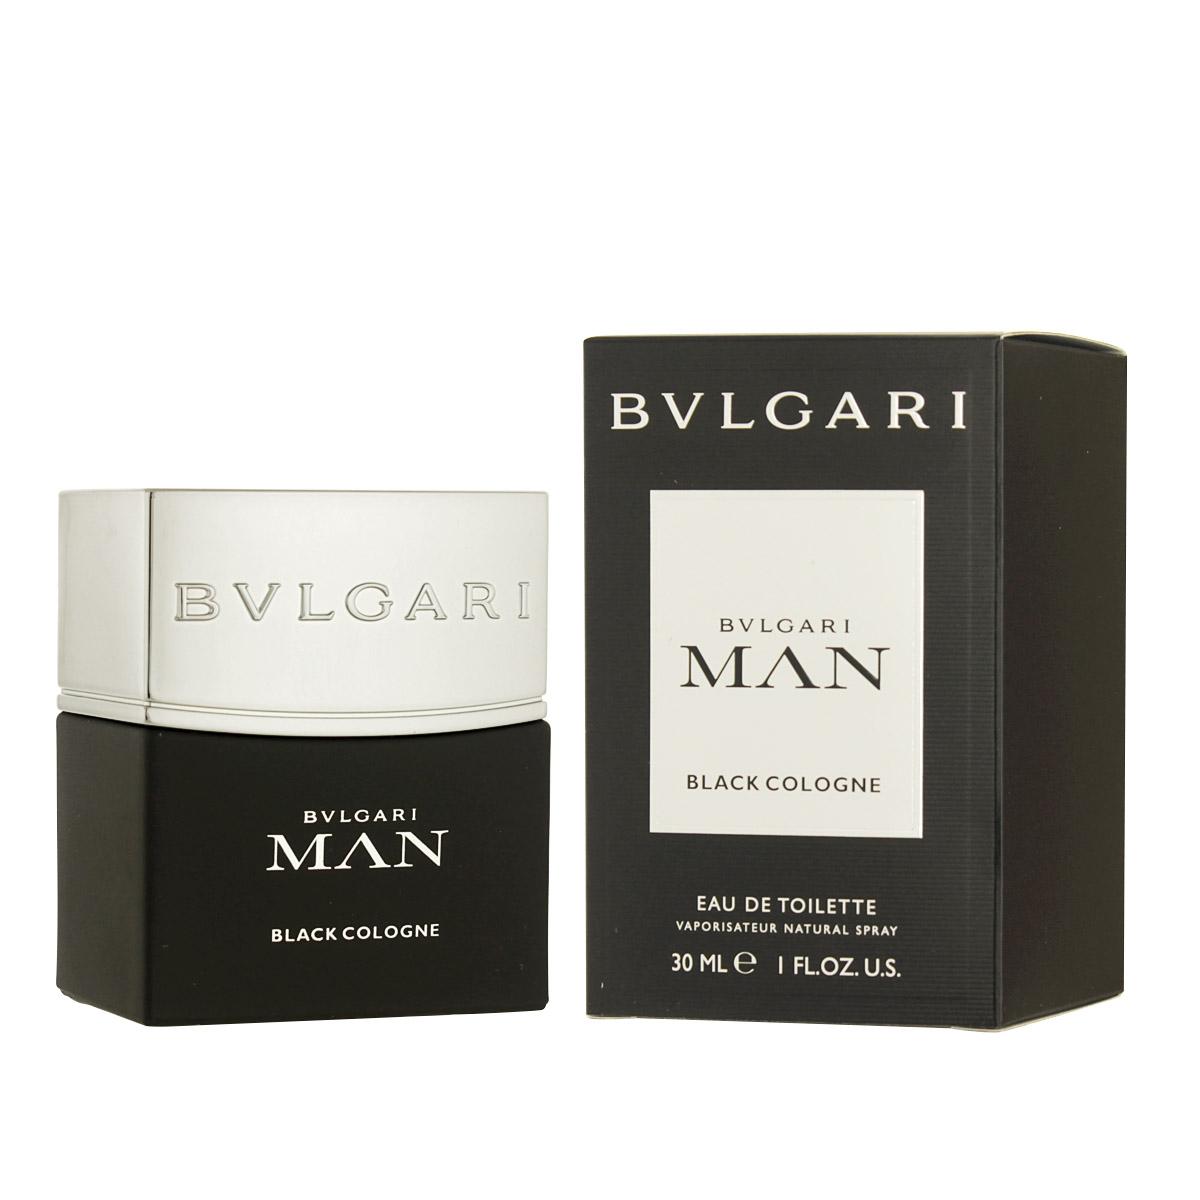 Bvlgari Man Black Cologne EDT 30 ml M